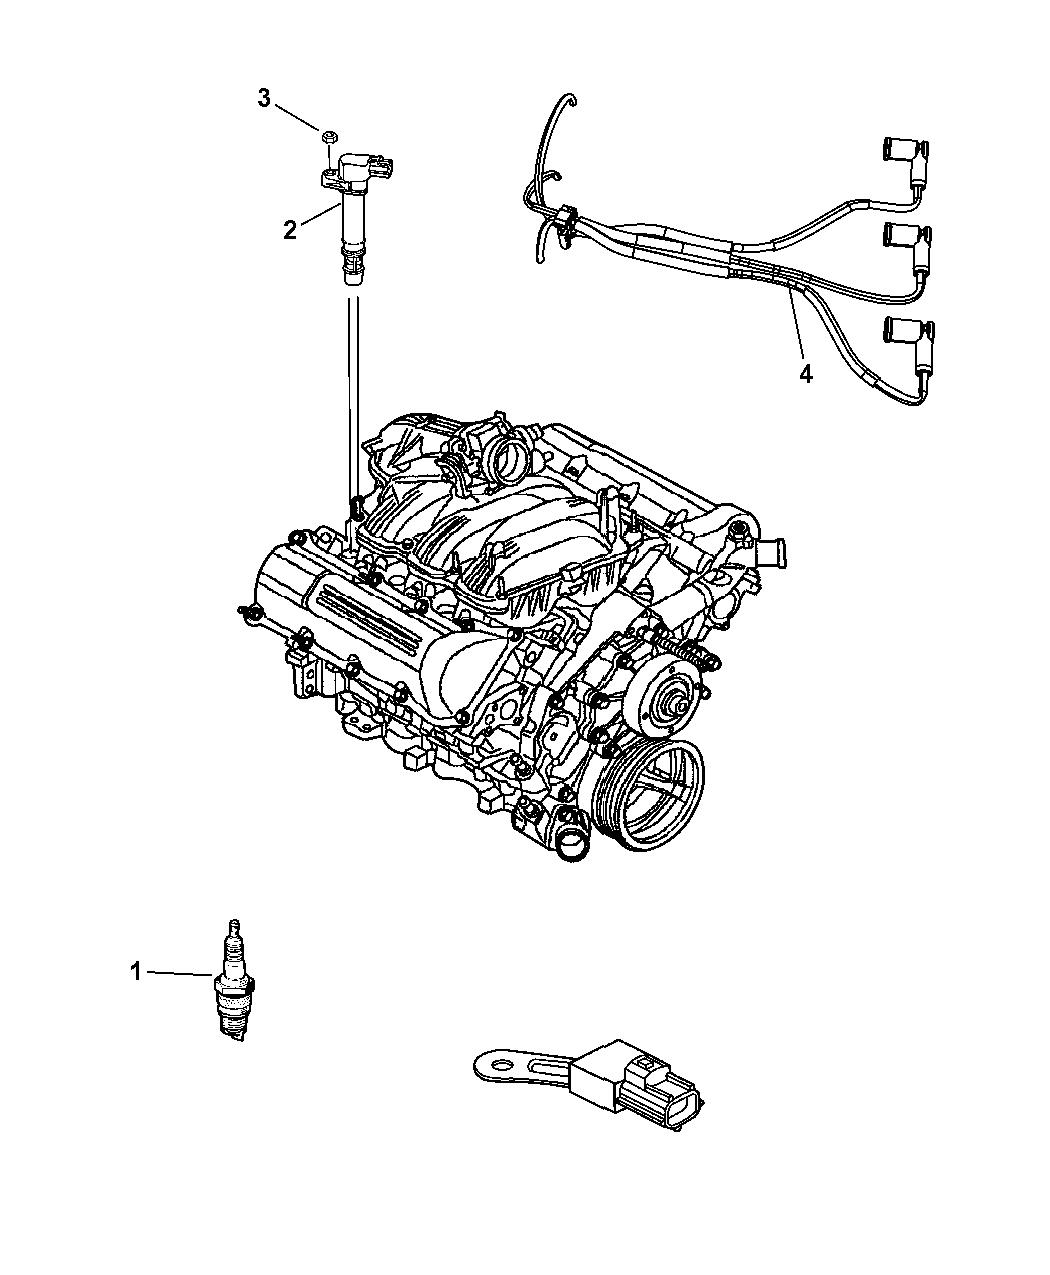 Dodge Avenger Diagram Additionally 1998 Dodge Ram 1500 Radio Wiring